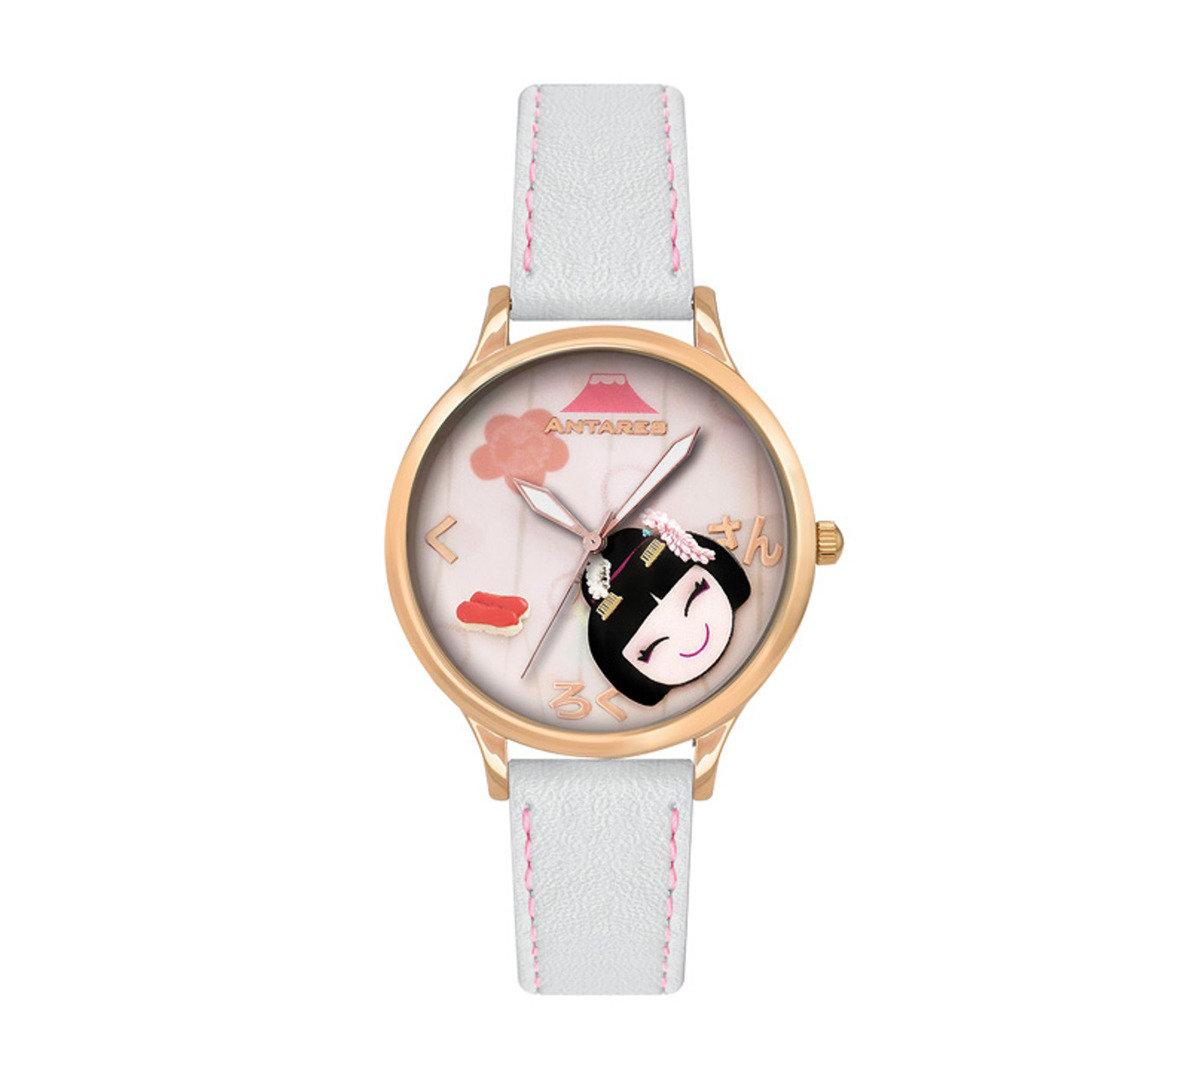 Dolly-Go-Around 旅行手錶 (日本)